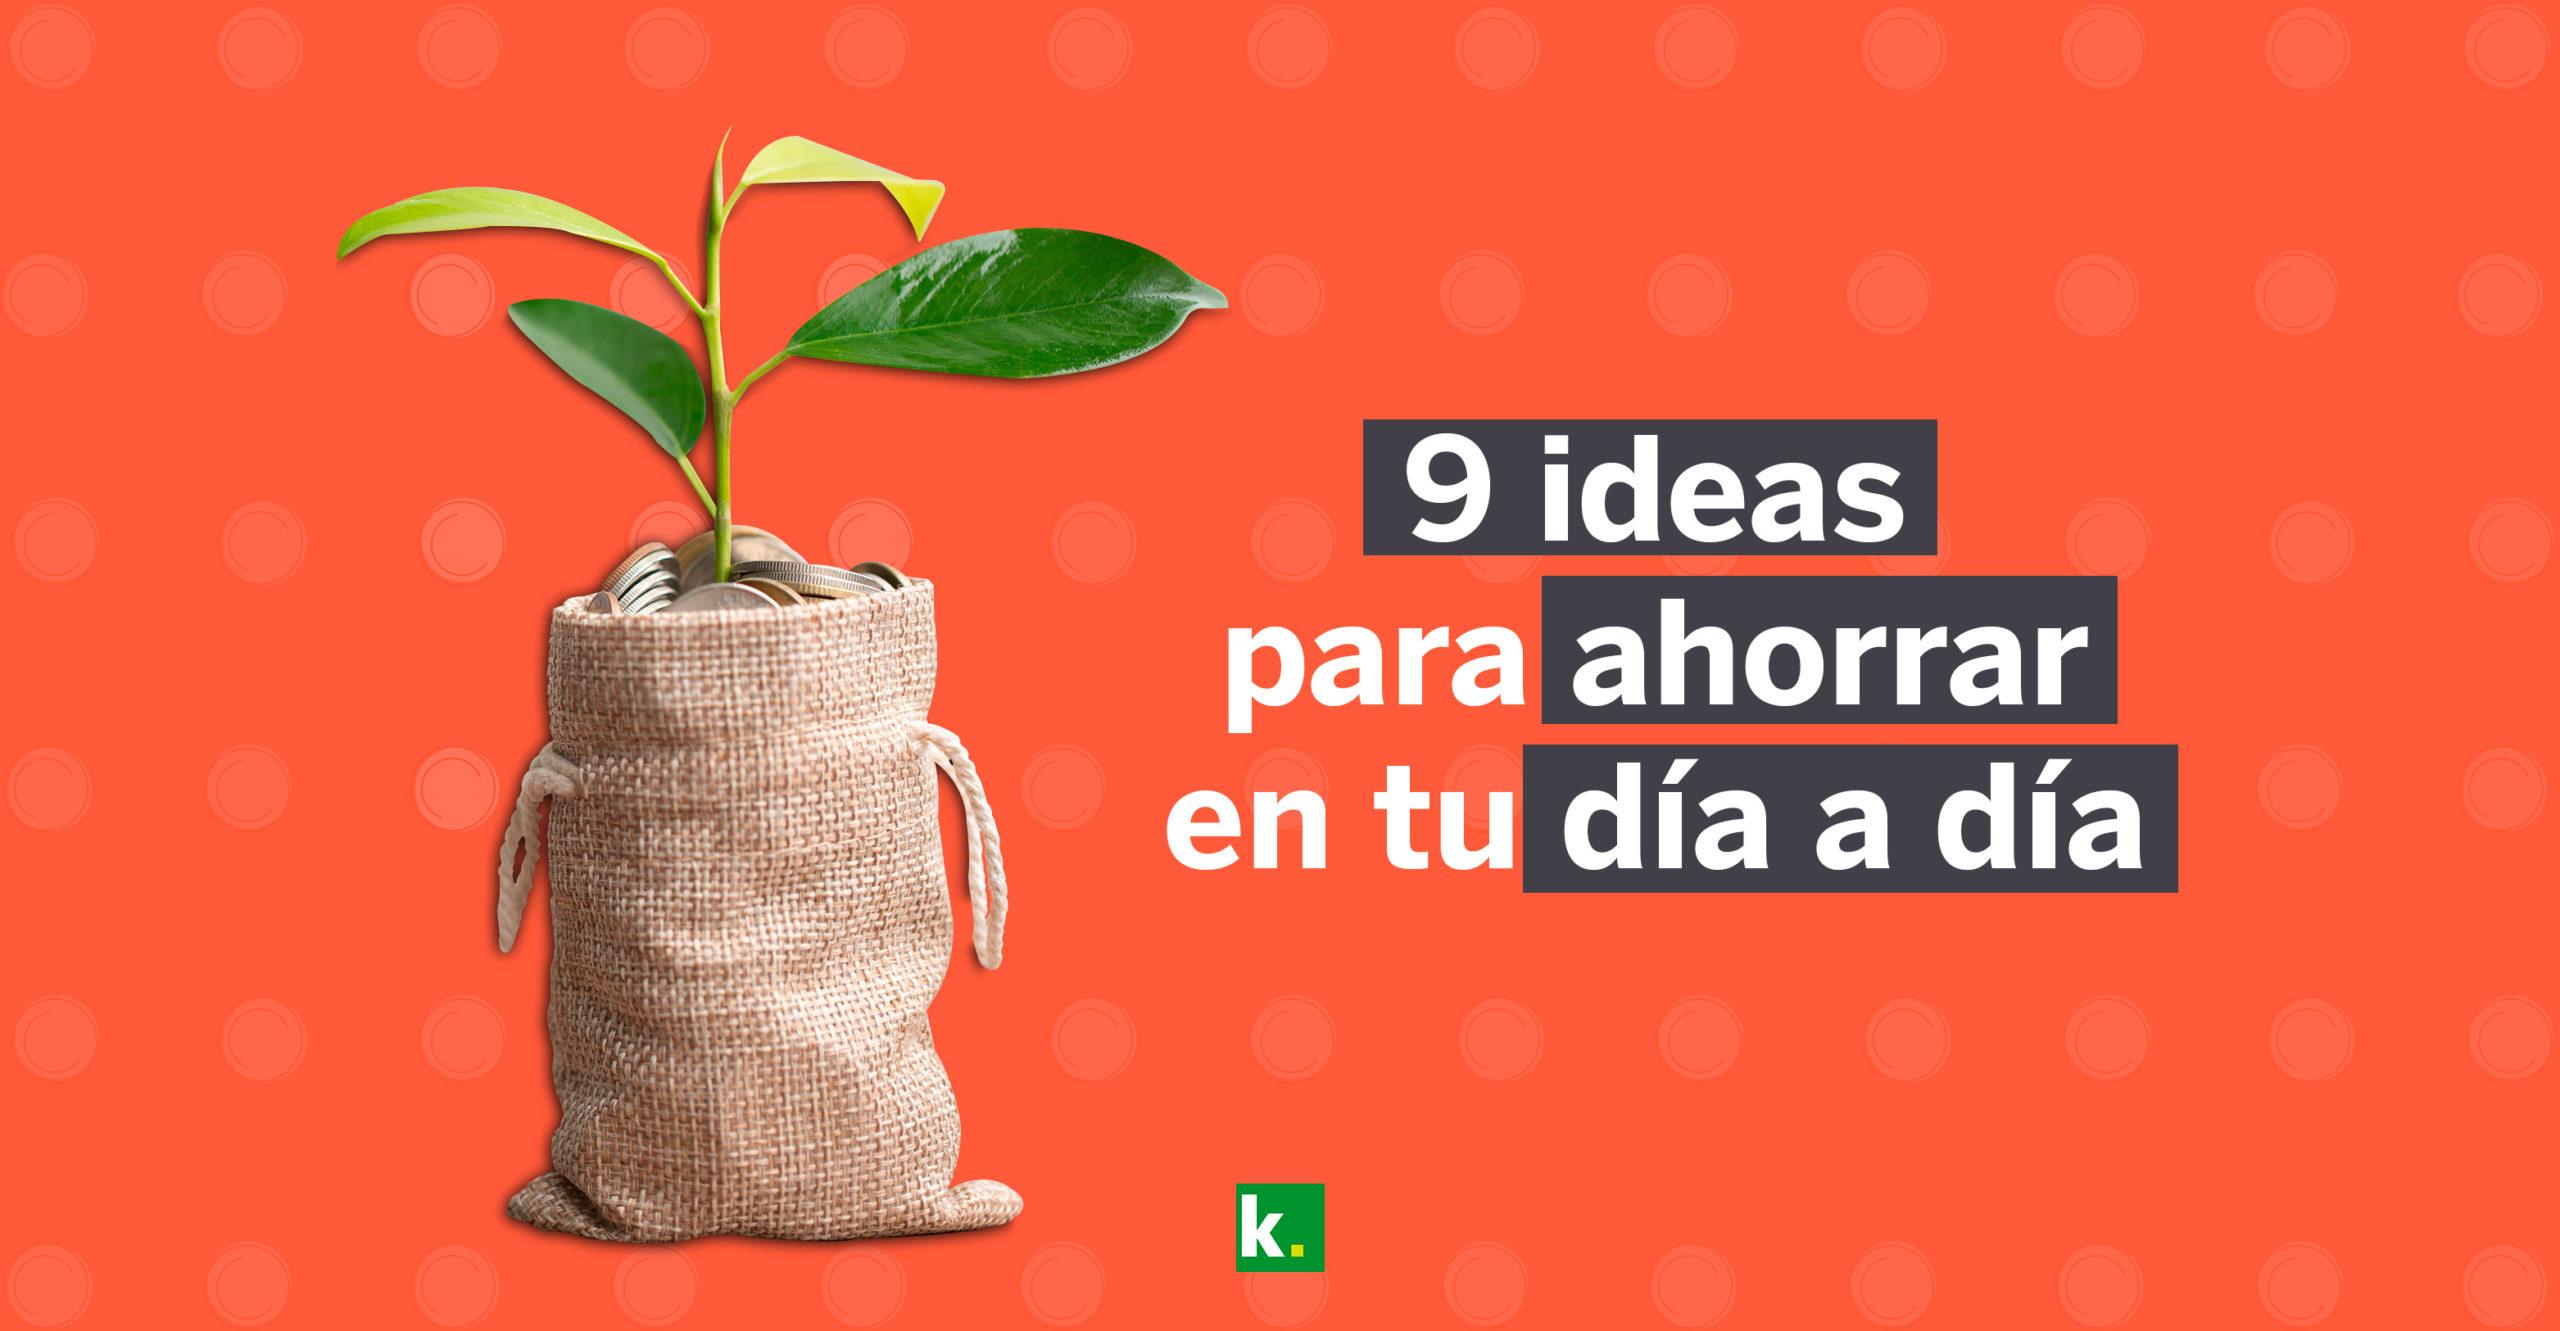 9 ideas para ahorrar en tu día a día